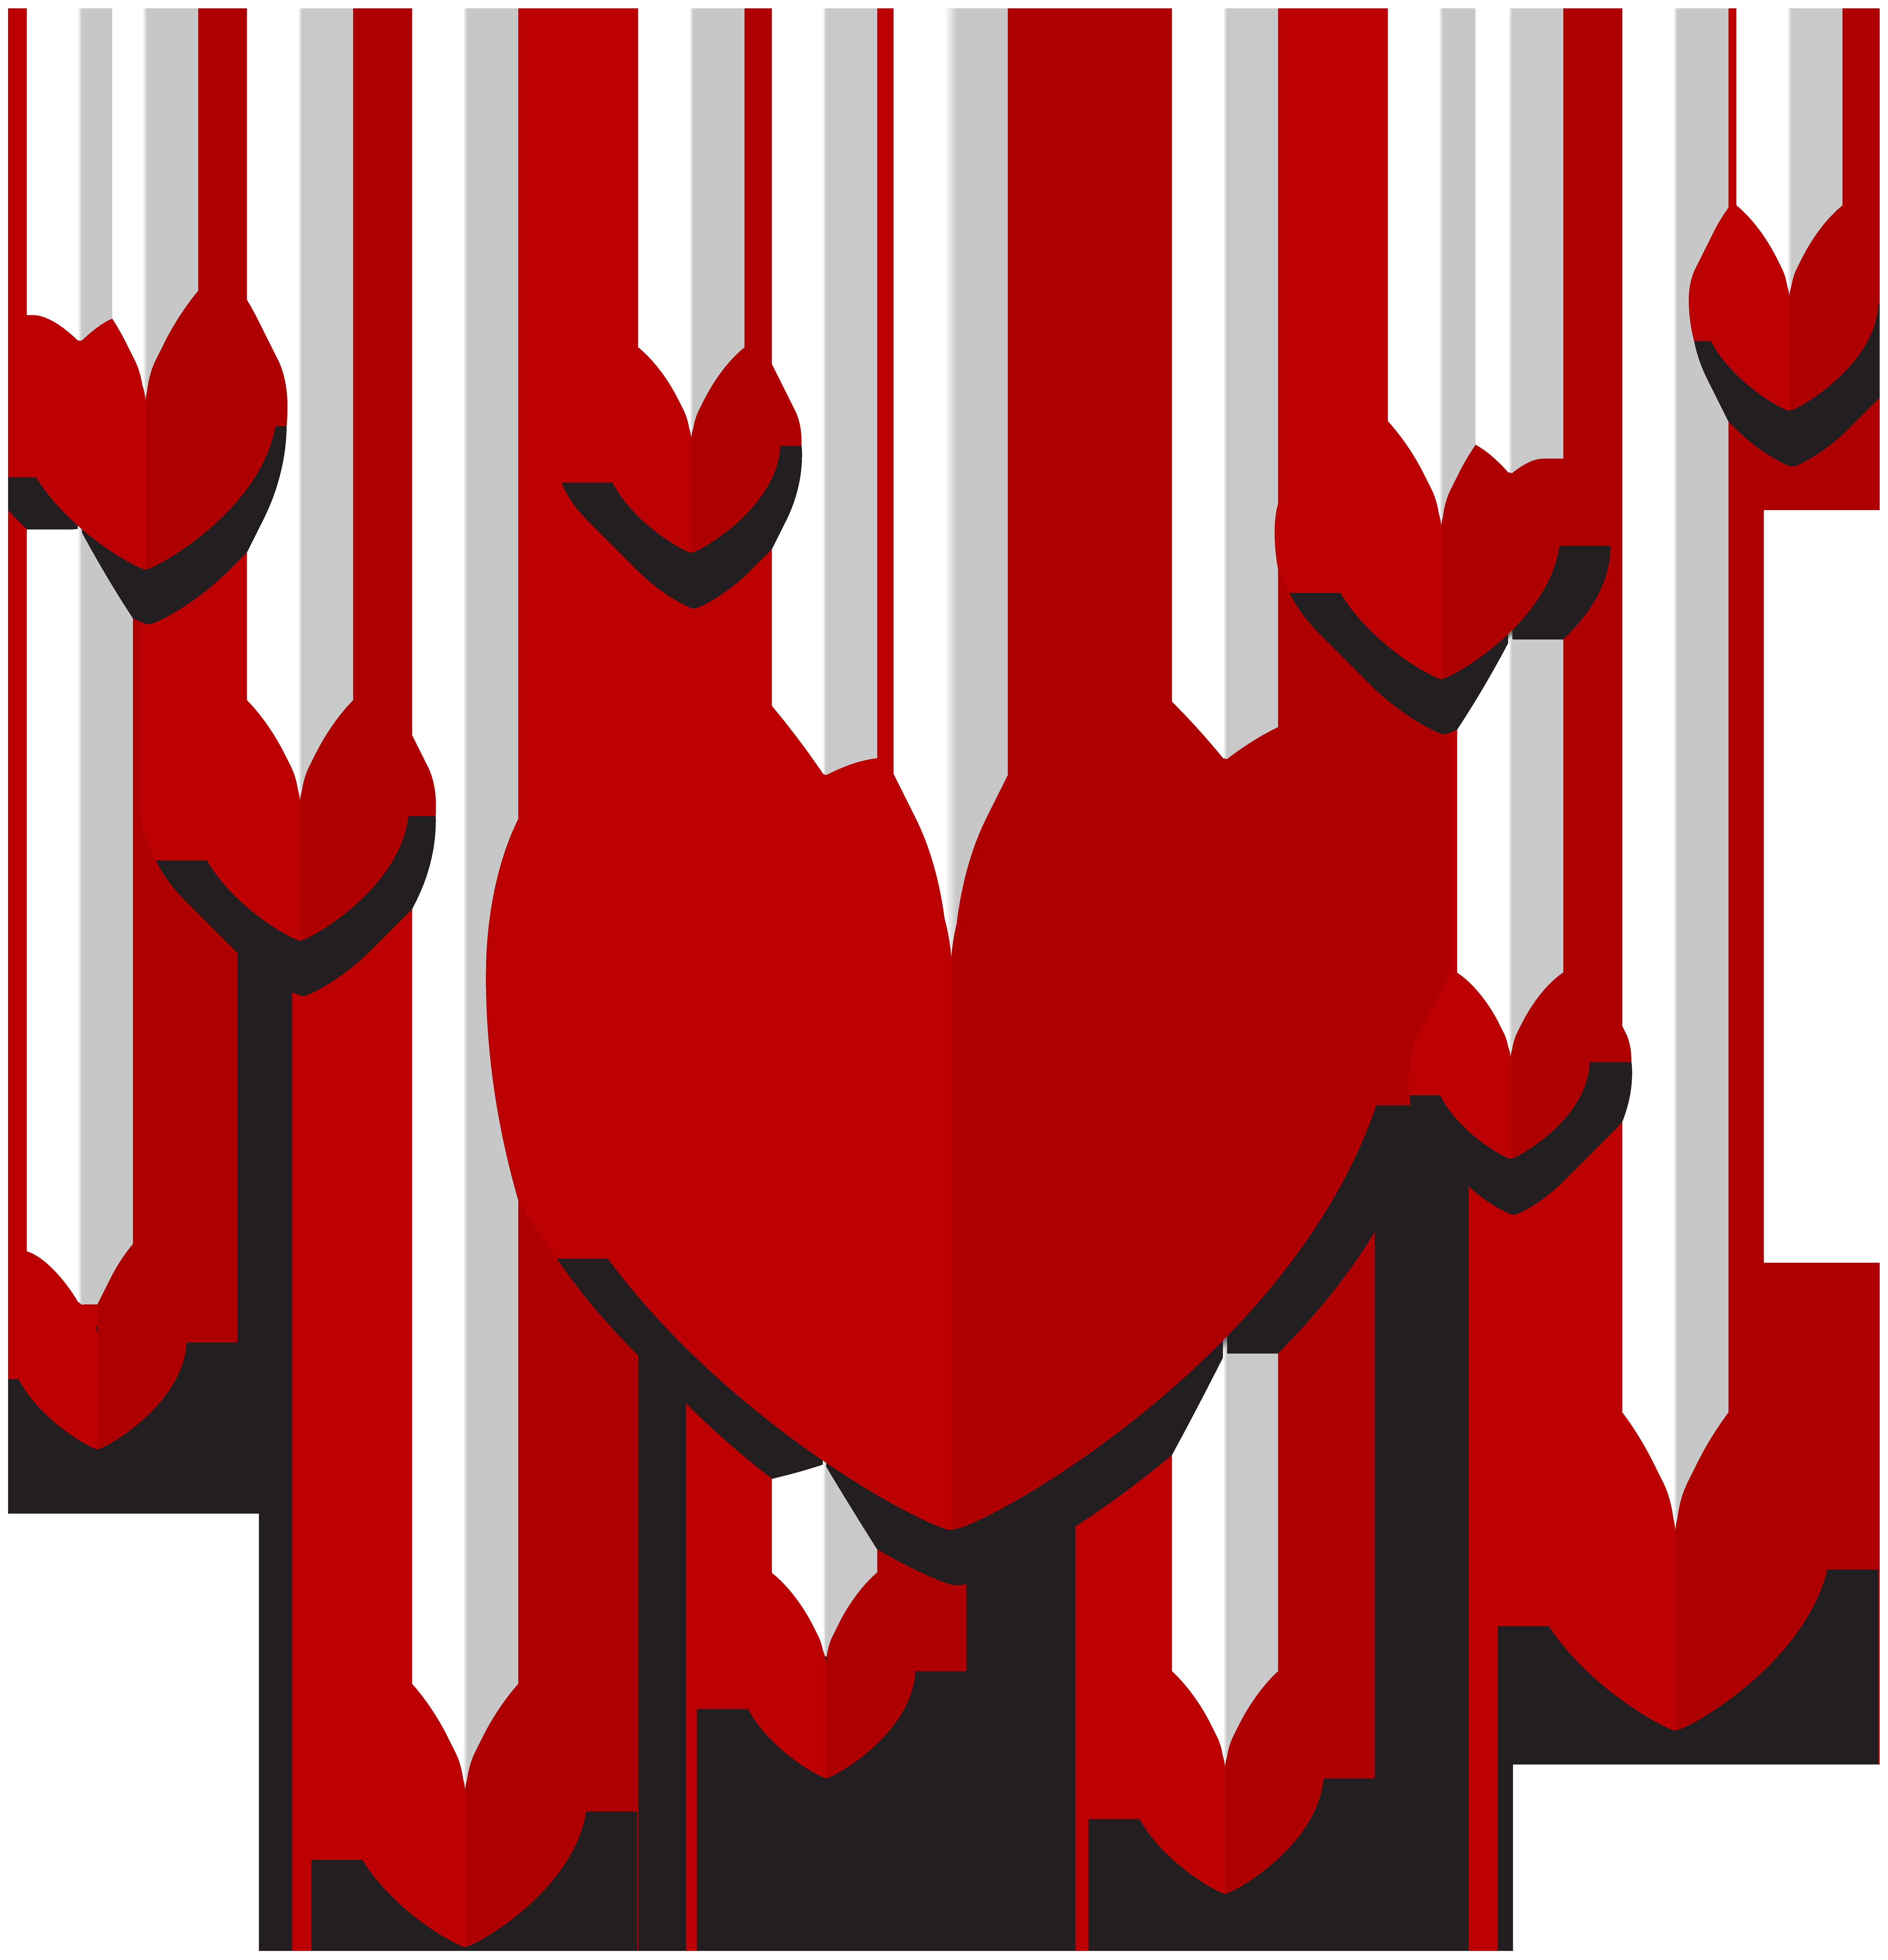 Hearts clipart decoration. Hanging decor png clip